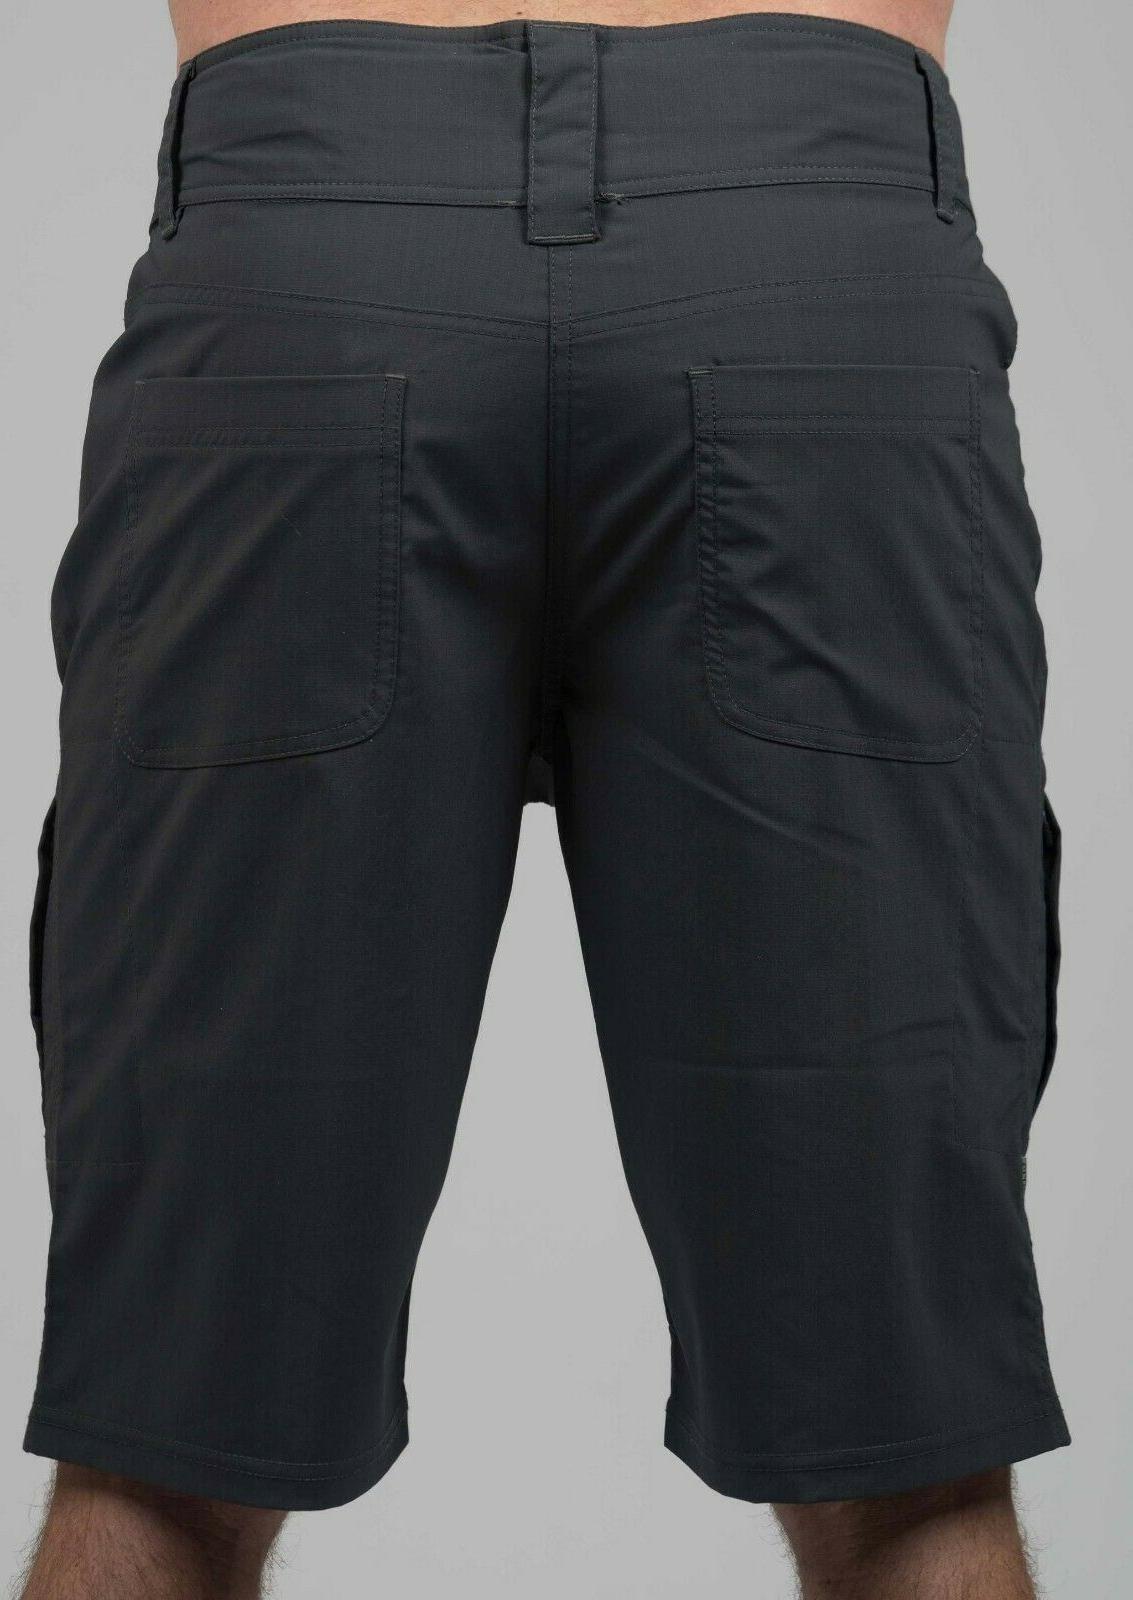 Club Ride Mountain Bike Short; Men's, Asphalt,